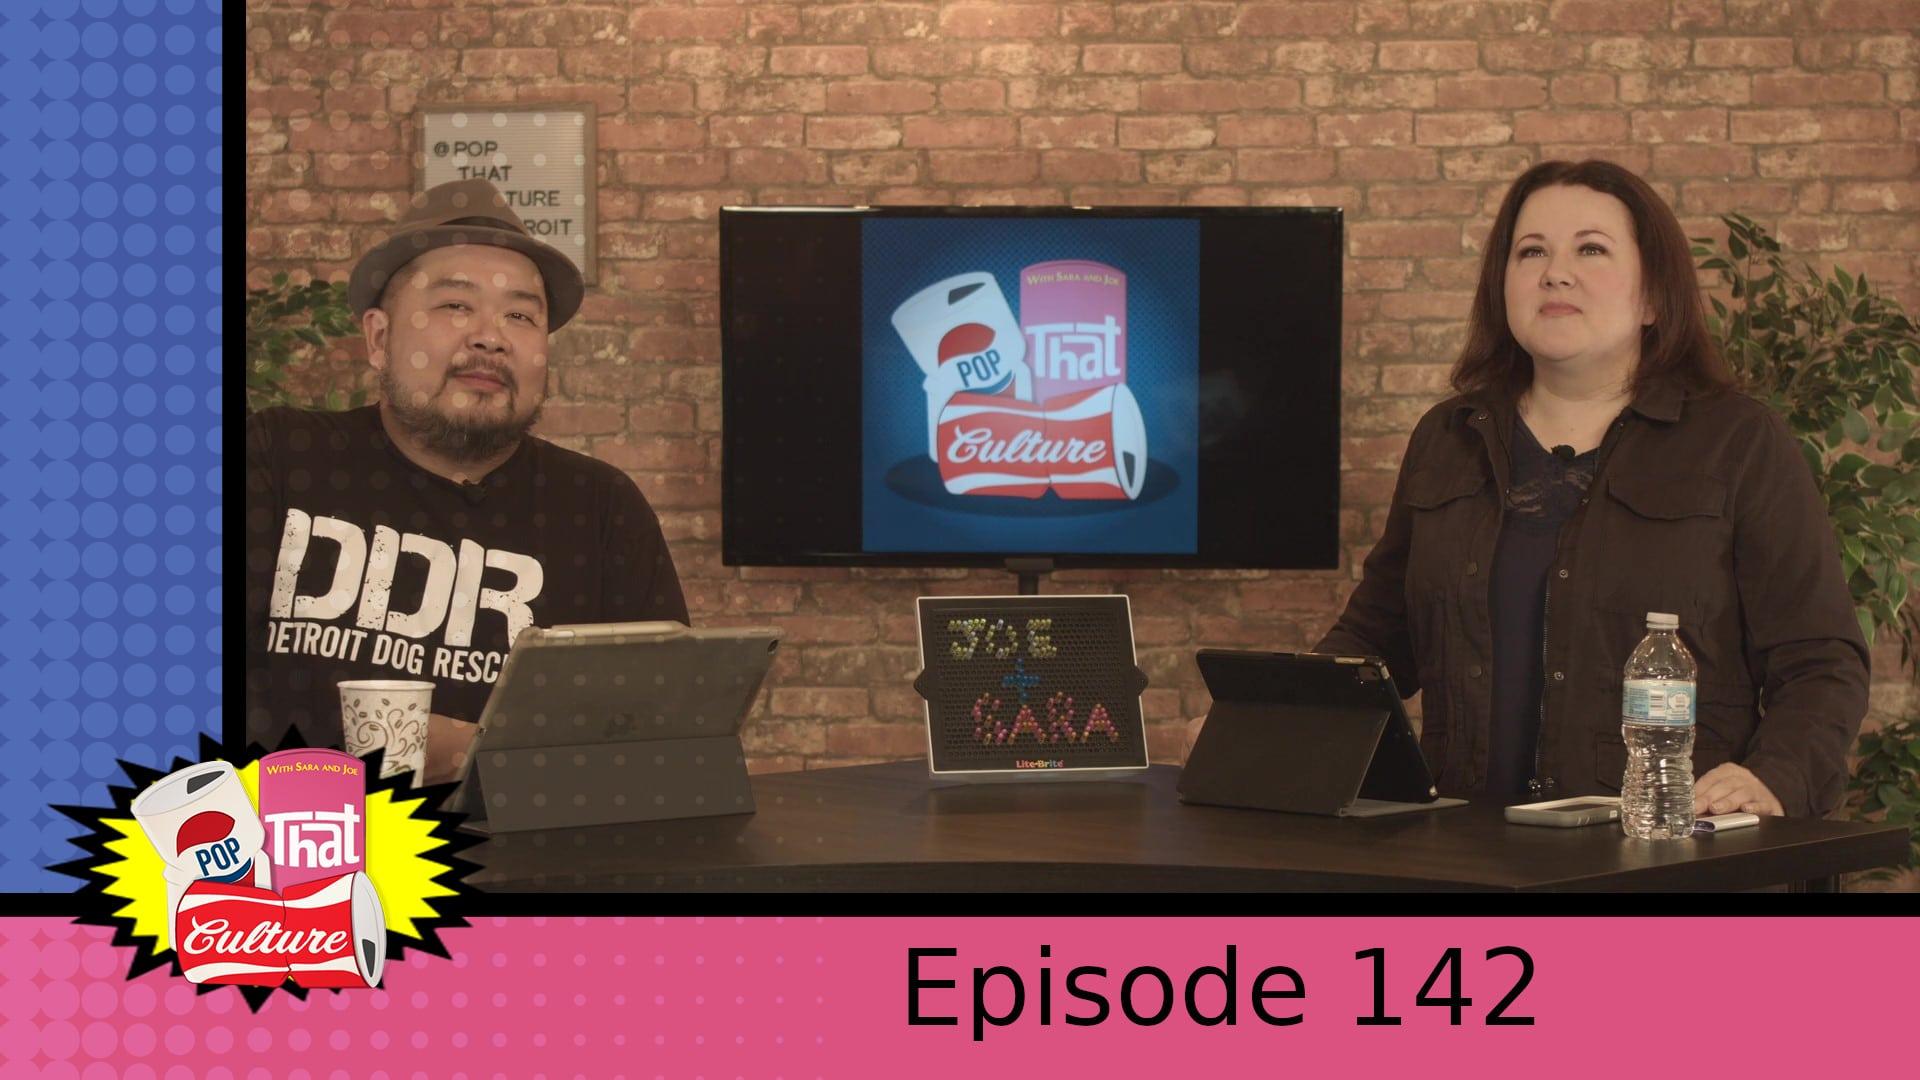 Pop That Culture - Episode 142